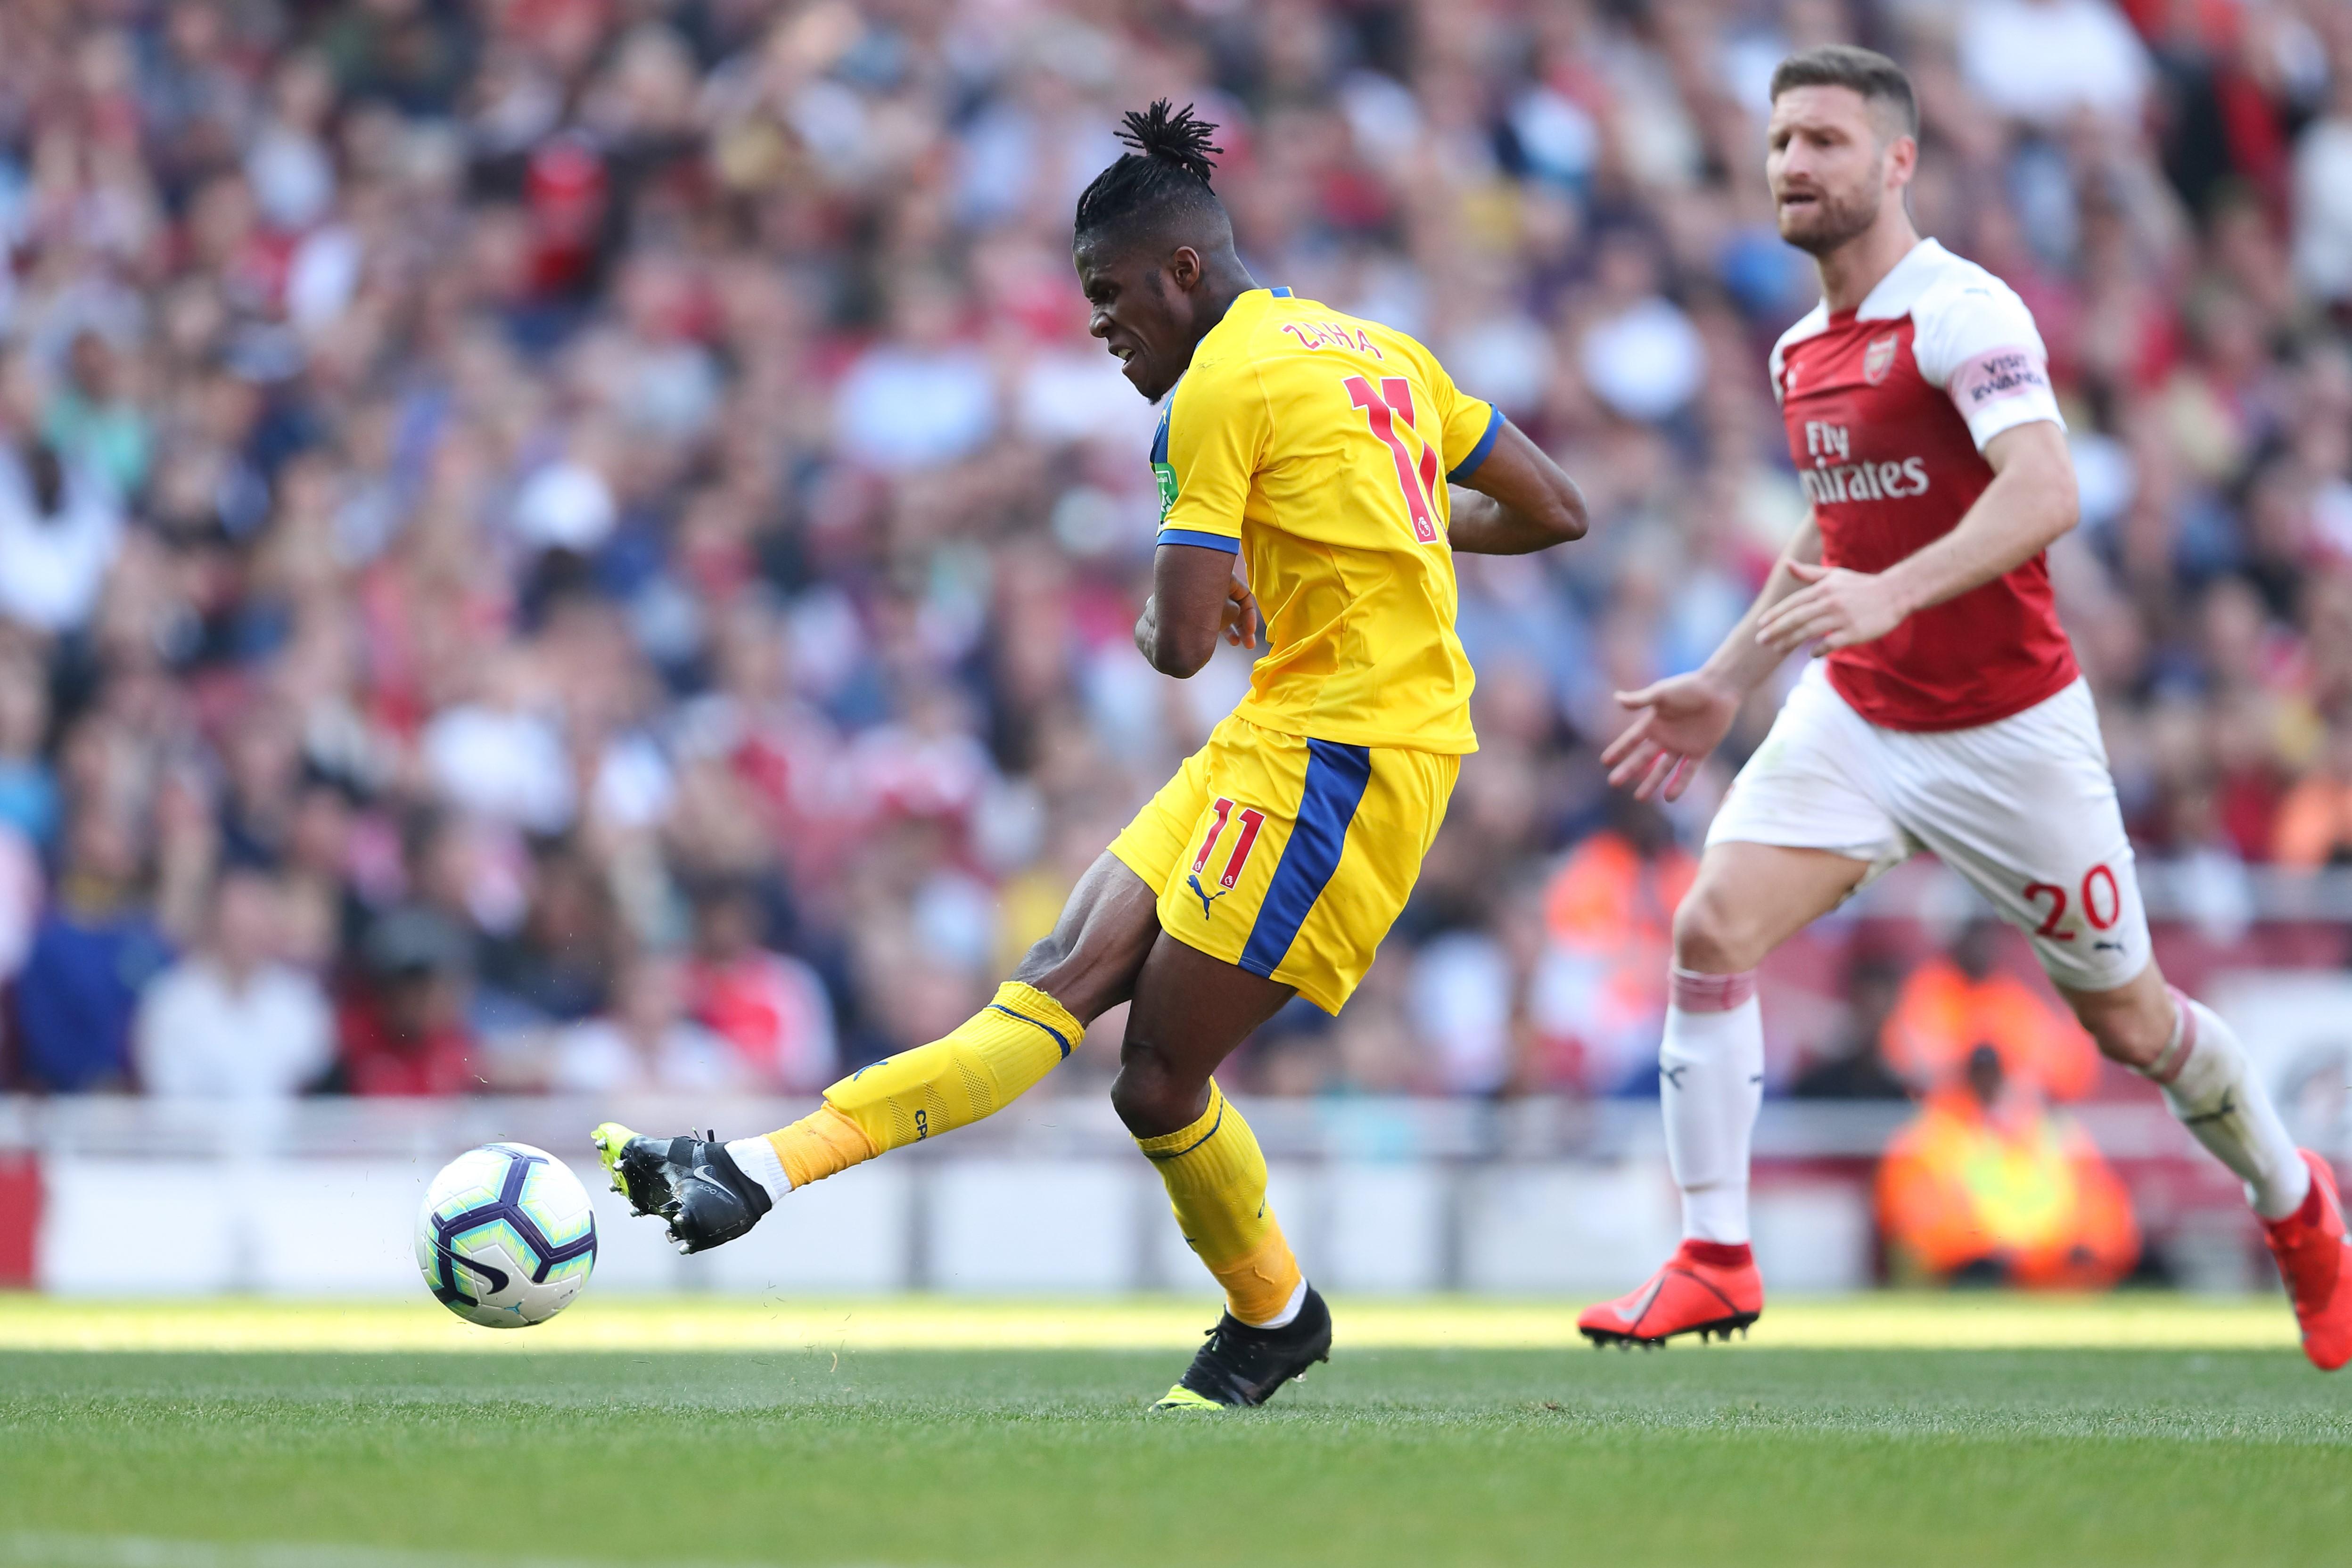 Wilfried Zaha lors de la rencontre Arsenal-Crystal Palace